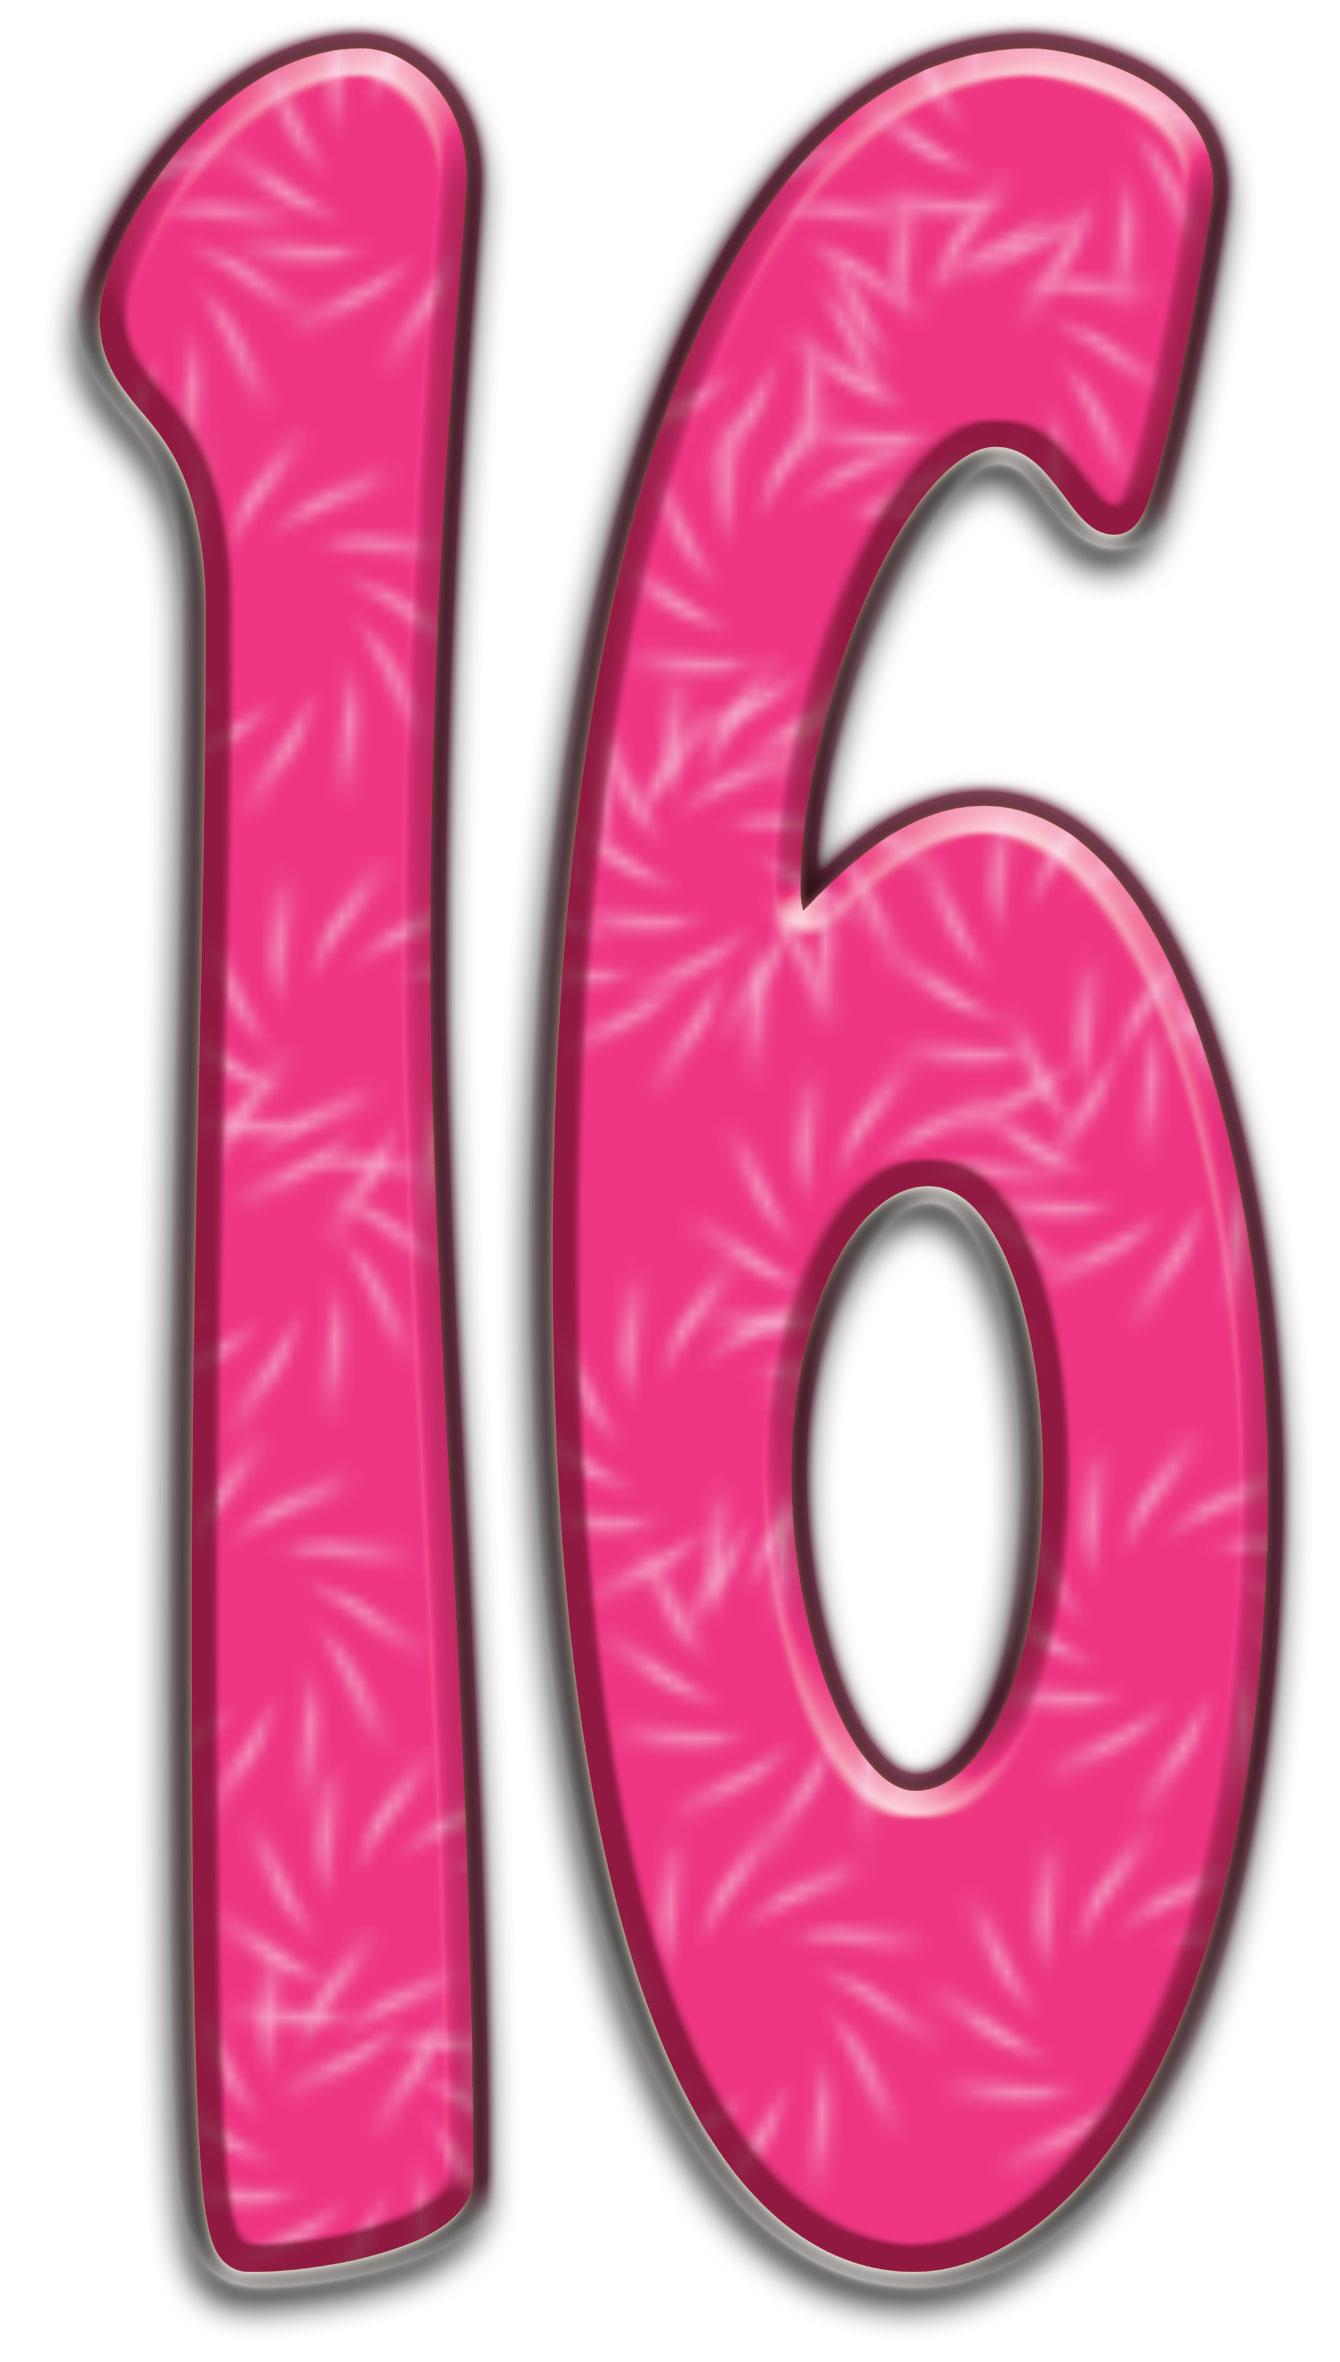 Открытка цифра 16, открыток пустые